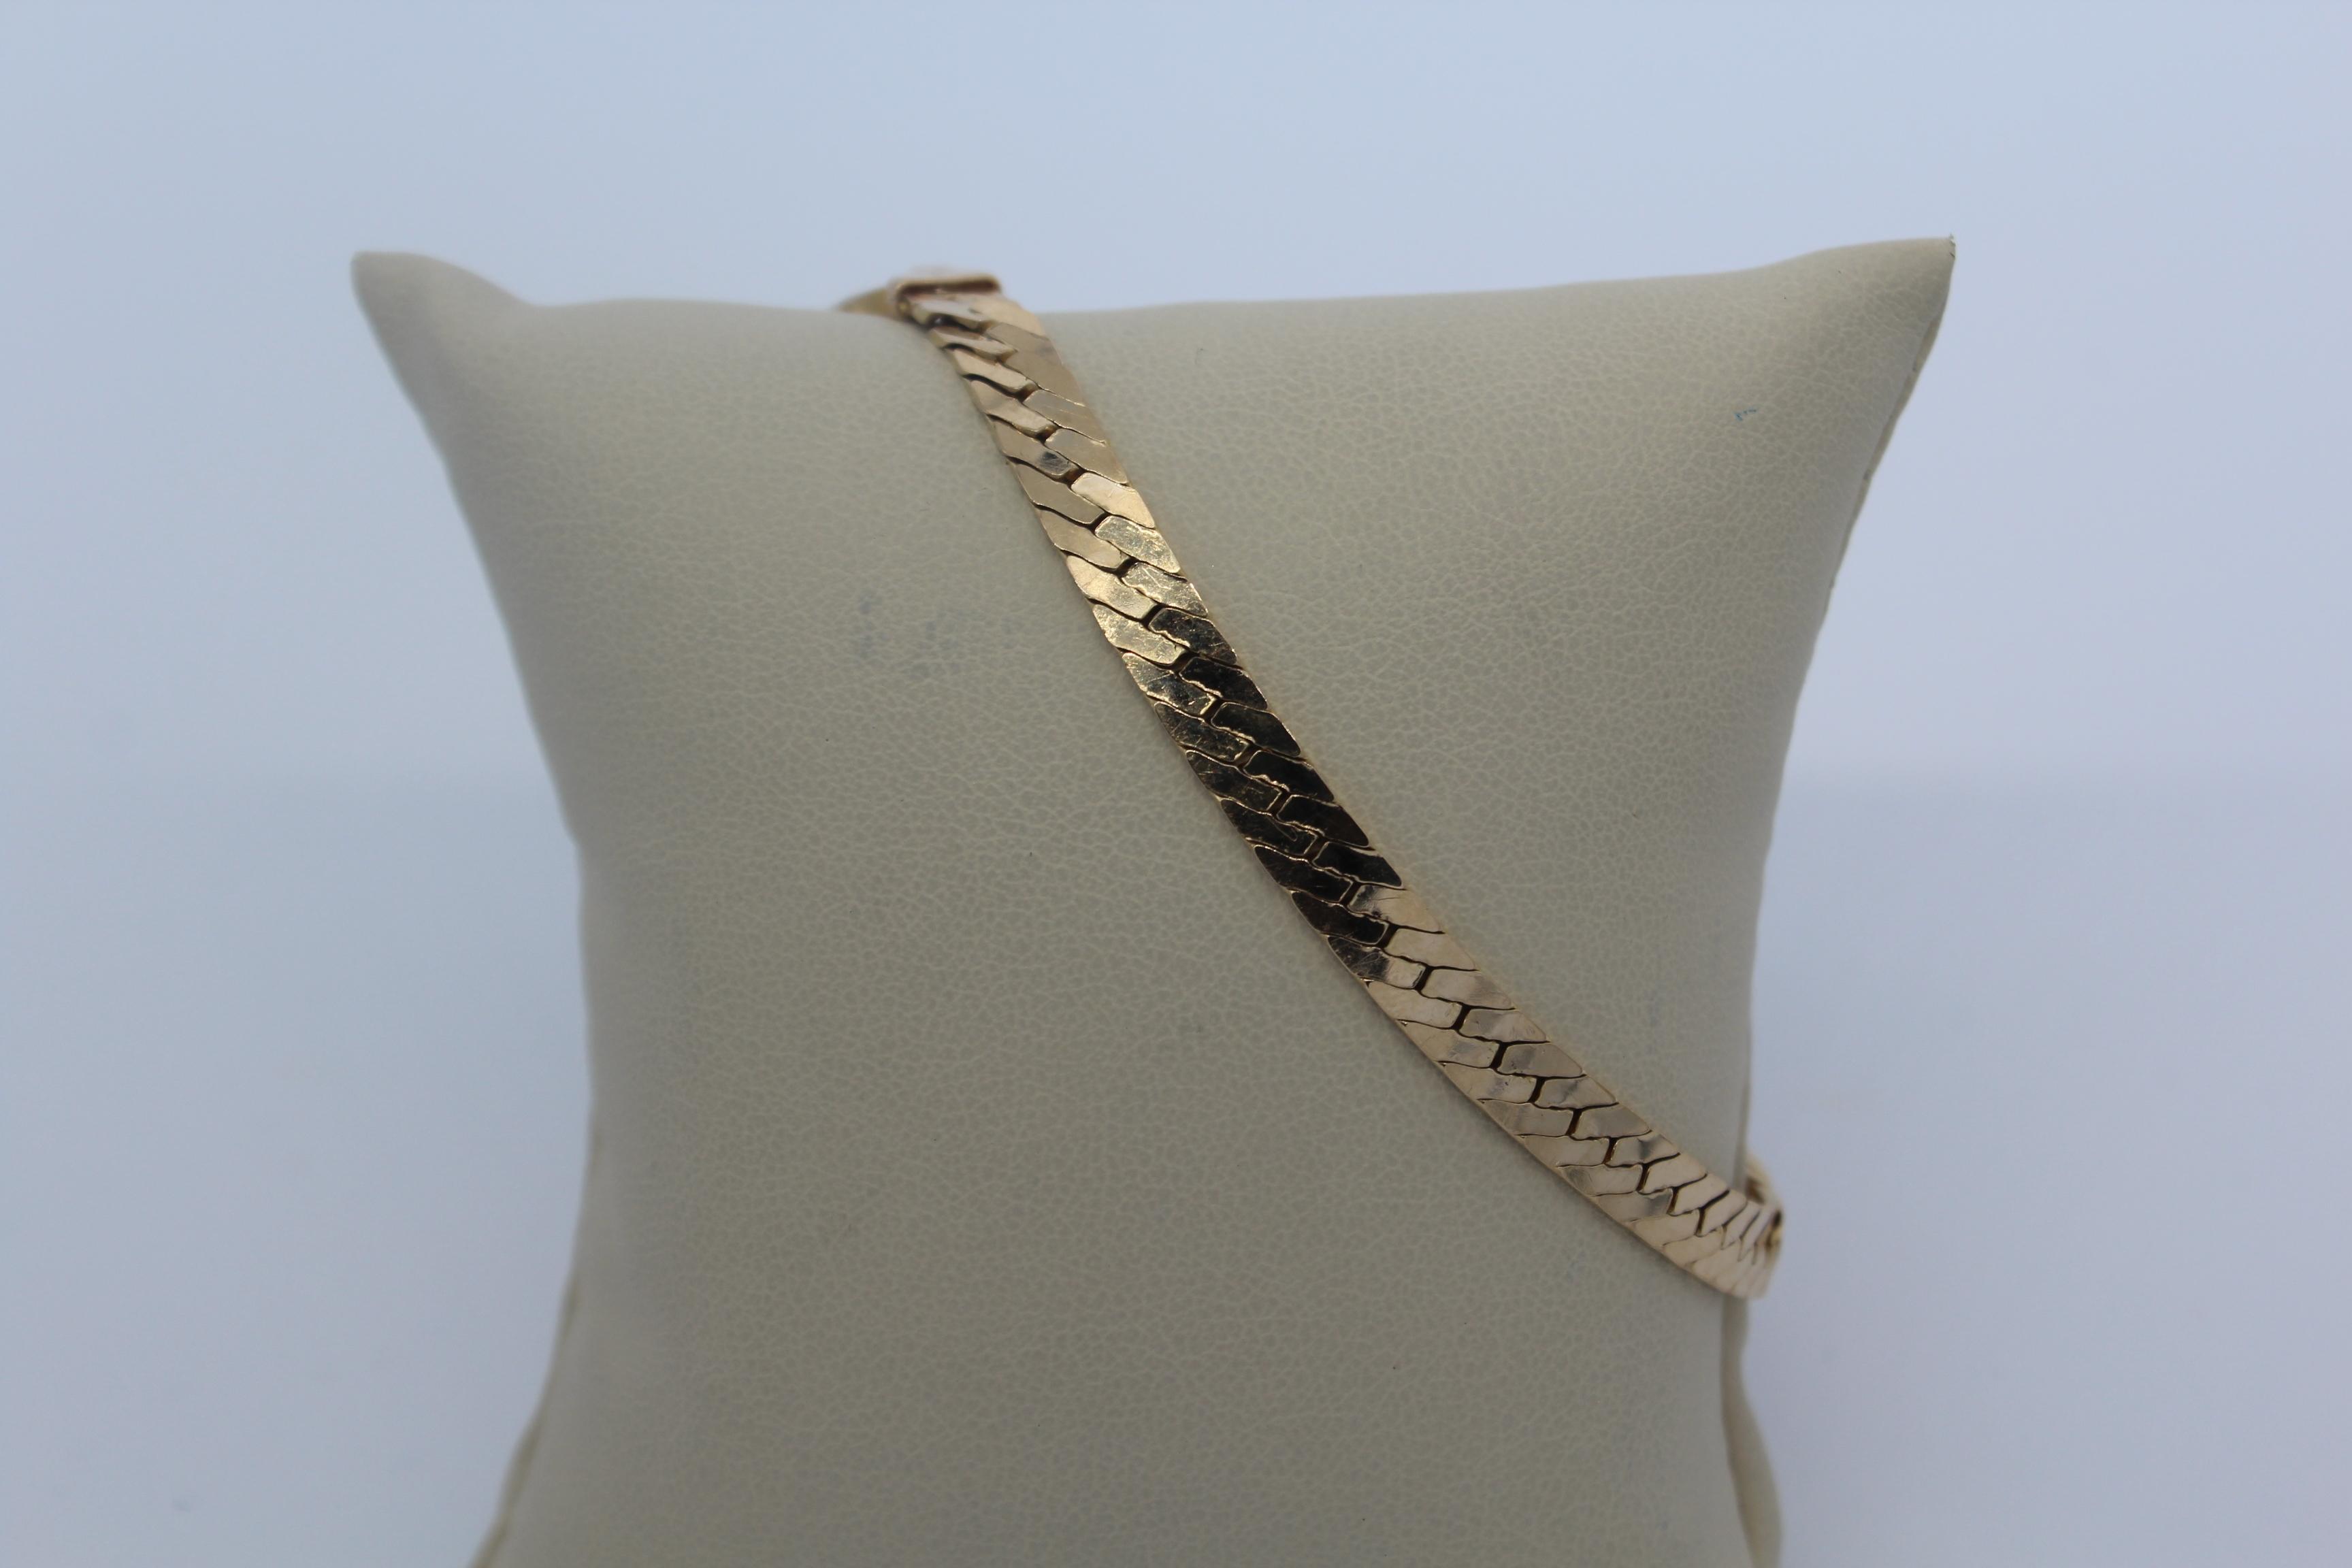 14K Serpentine Men's Bracelet